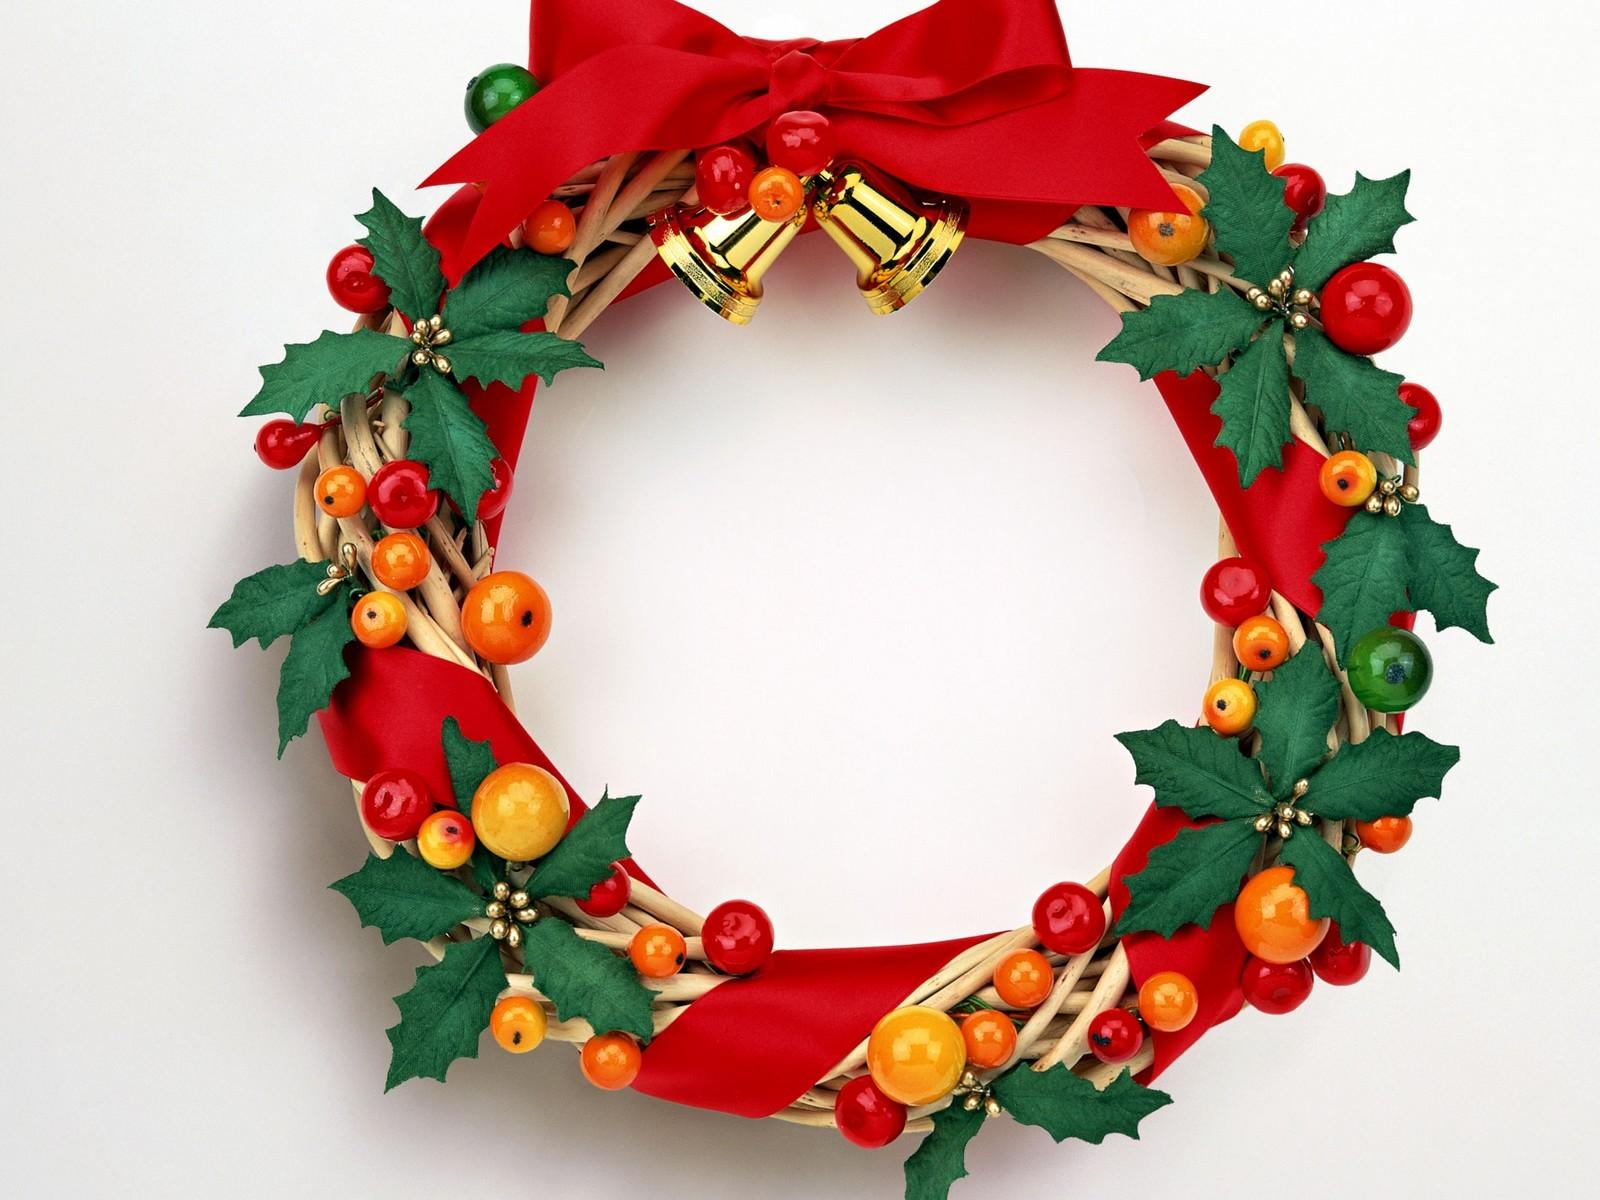 Nice Christmas Wreath 1600x1200 - Wallpaper ...